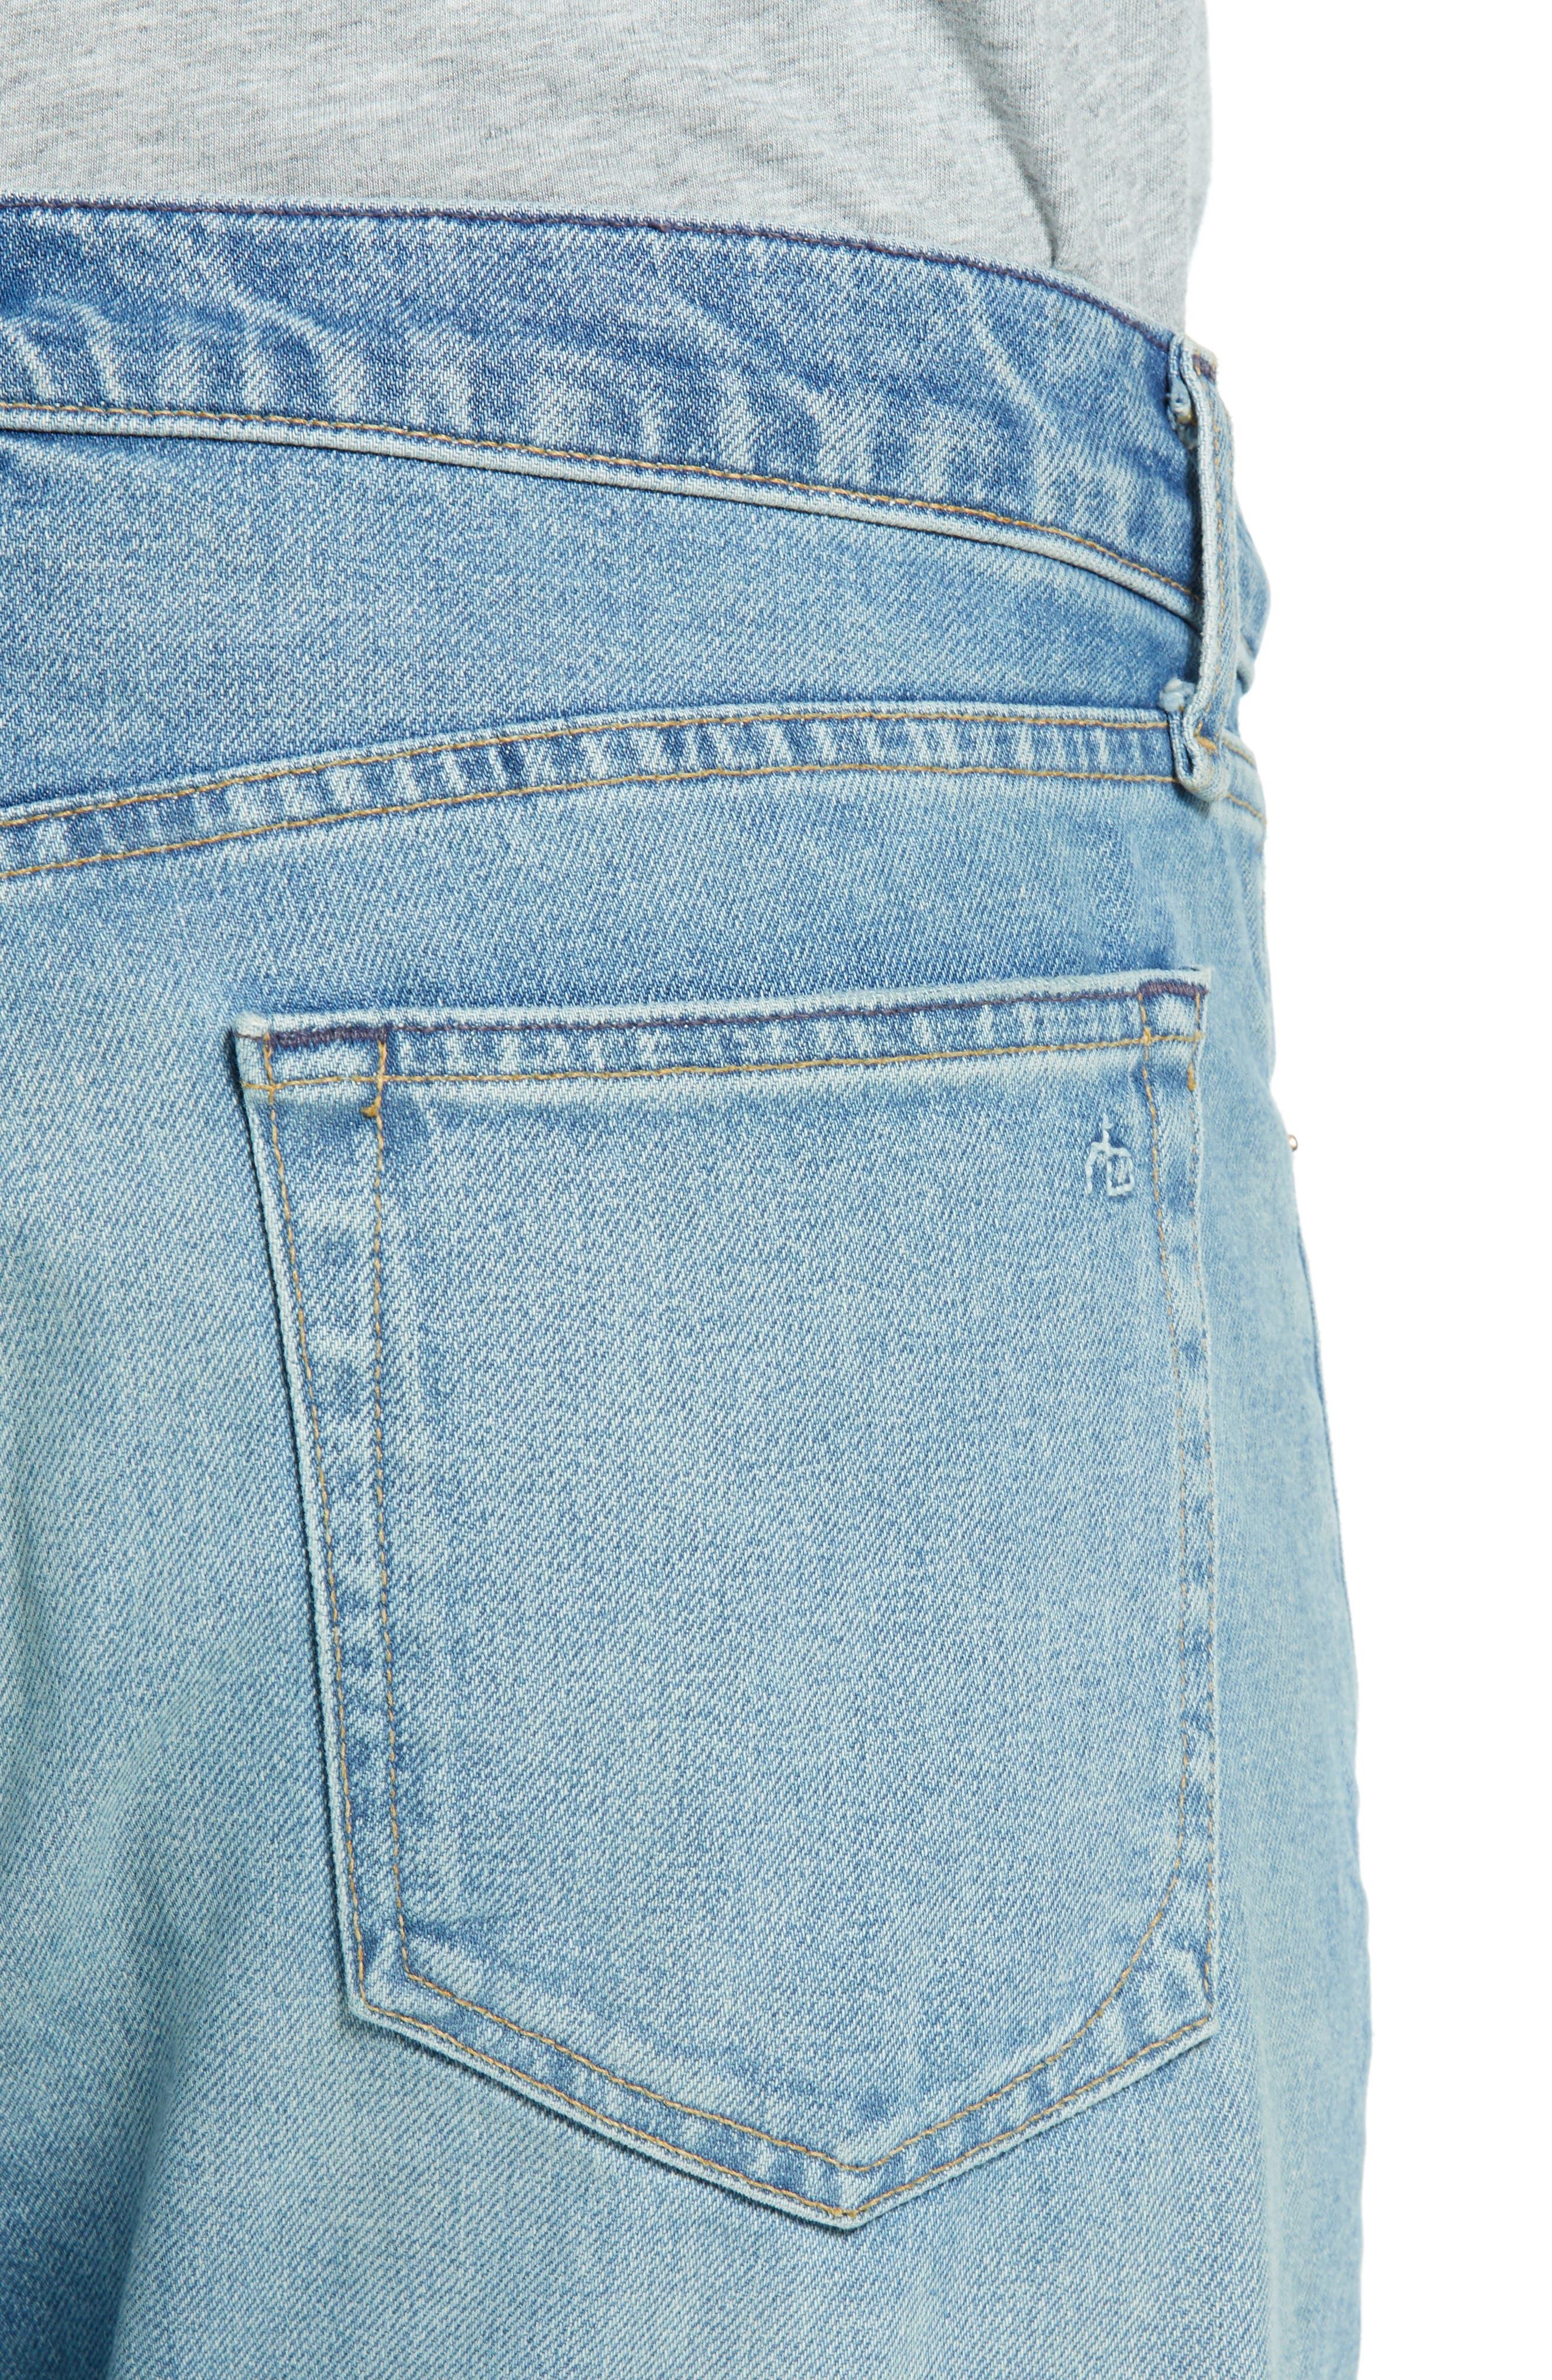 Fit 1 Skinny Fit Jeans,                             Alternate thumbnail 4, color,                             JAMIE